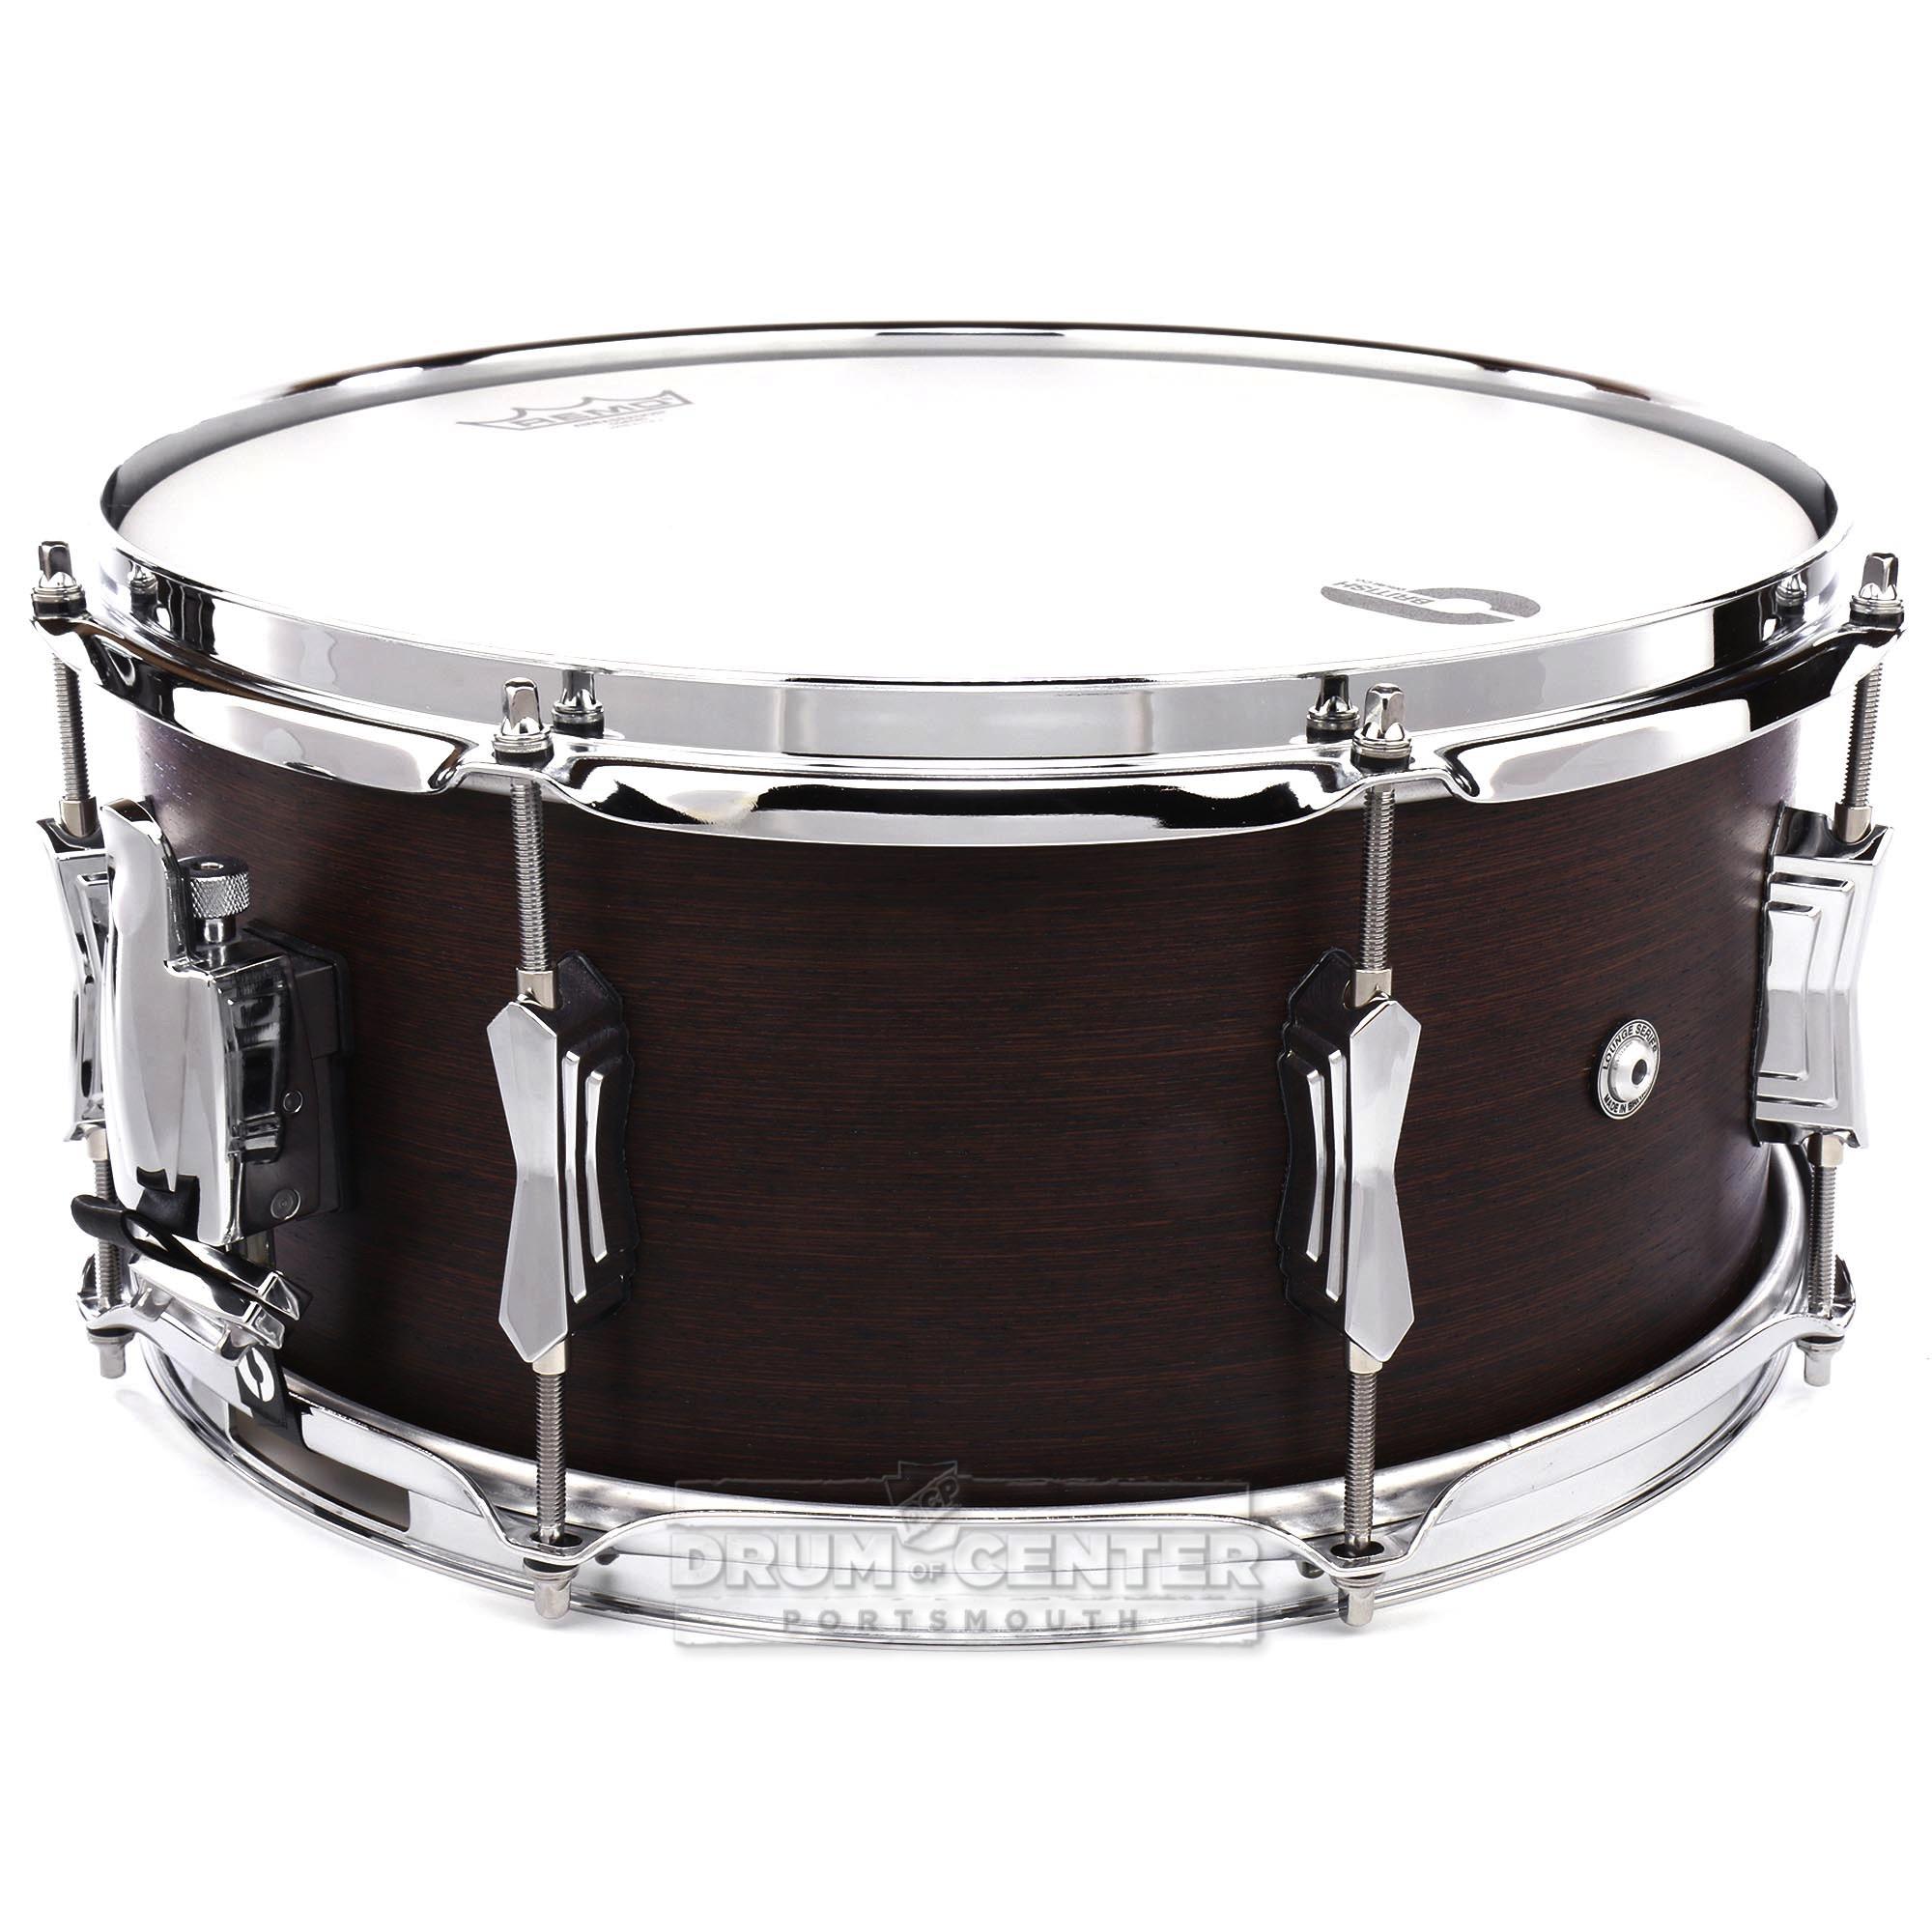 british drum company lounge series snare drum kensington crown 14x6 5 882030238581 ebay. Black Bedroom Furniture Sets. Home Design Ideas